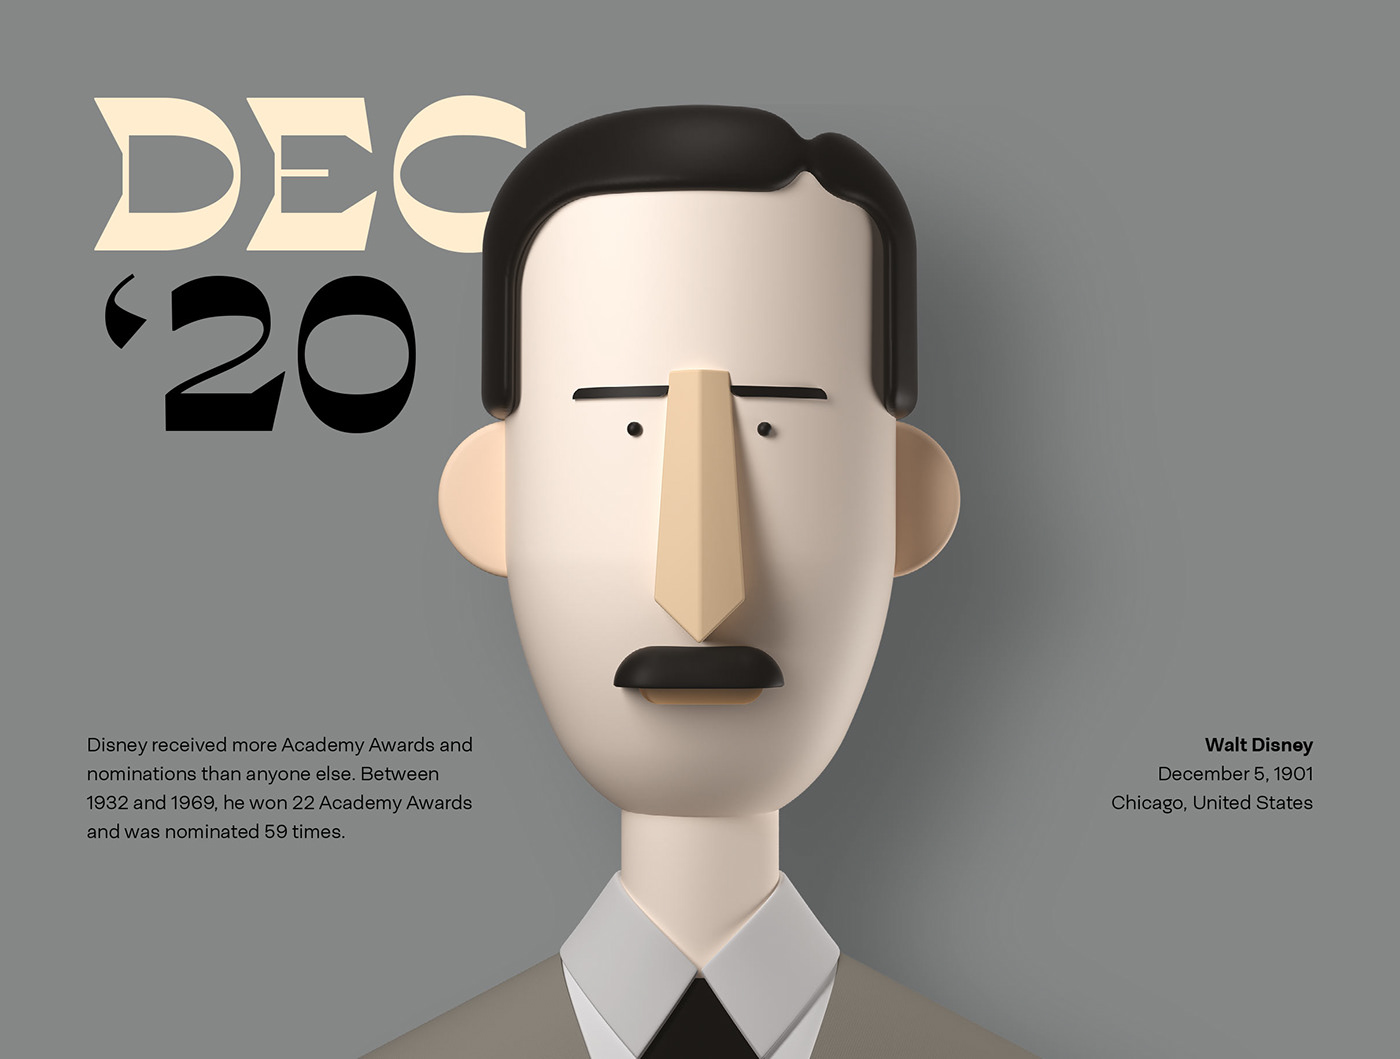 3D Character bill murray braca burazeri bruce lee Dechko Tzar ILLUSTRATION  LeBron James Marilyn Monroe nikola tesla salvador dali